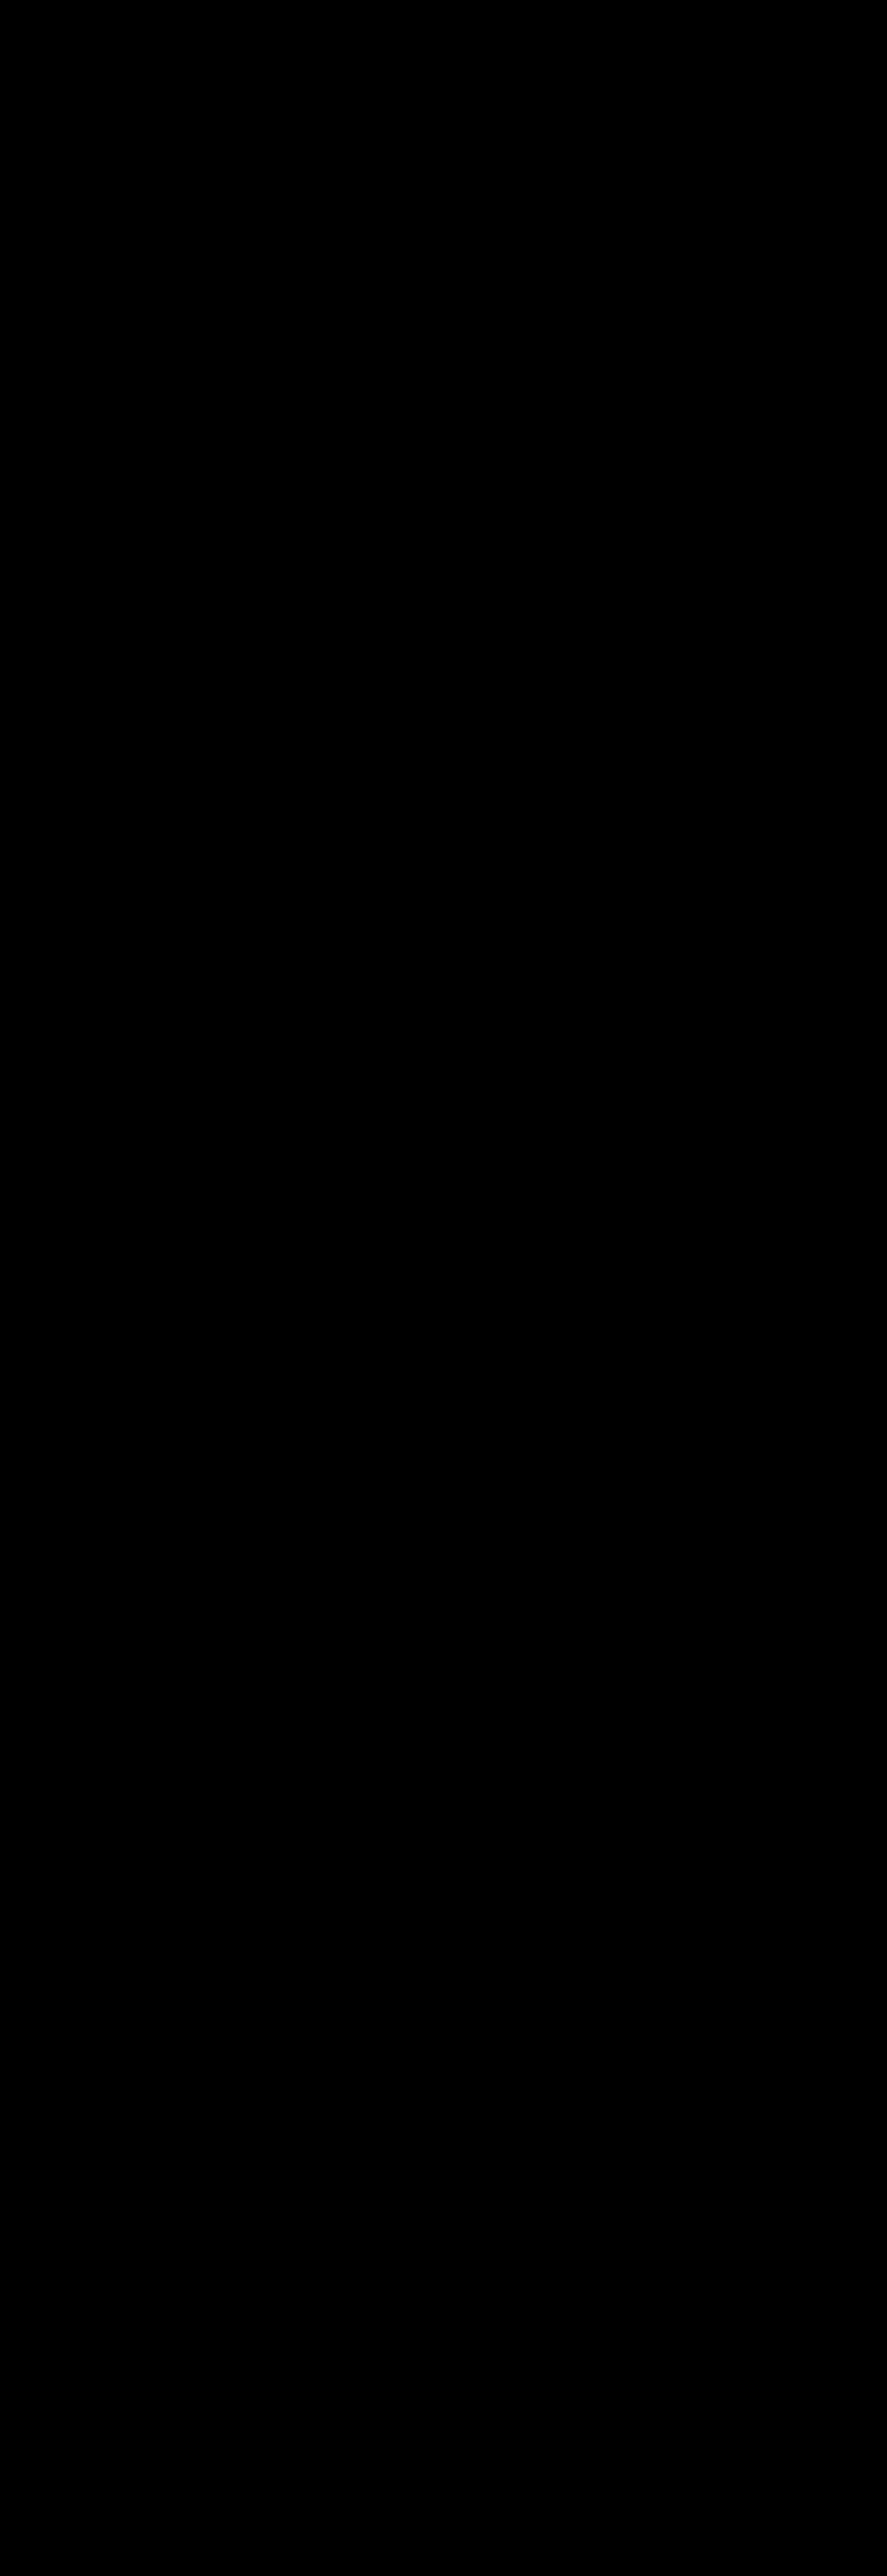 2000x5810 Filesilhouette.svg